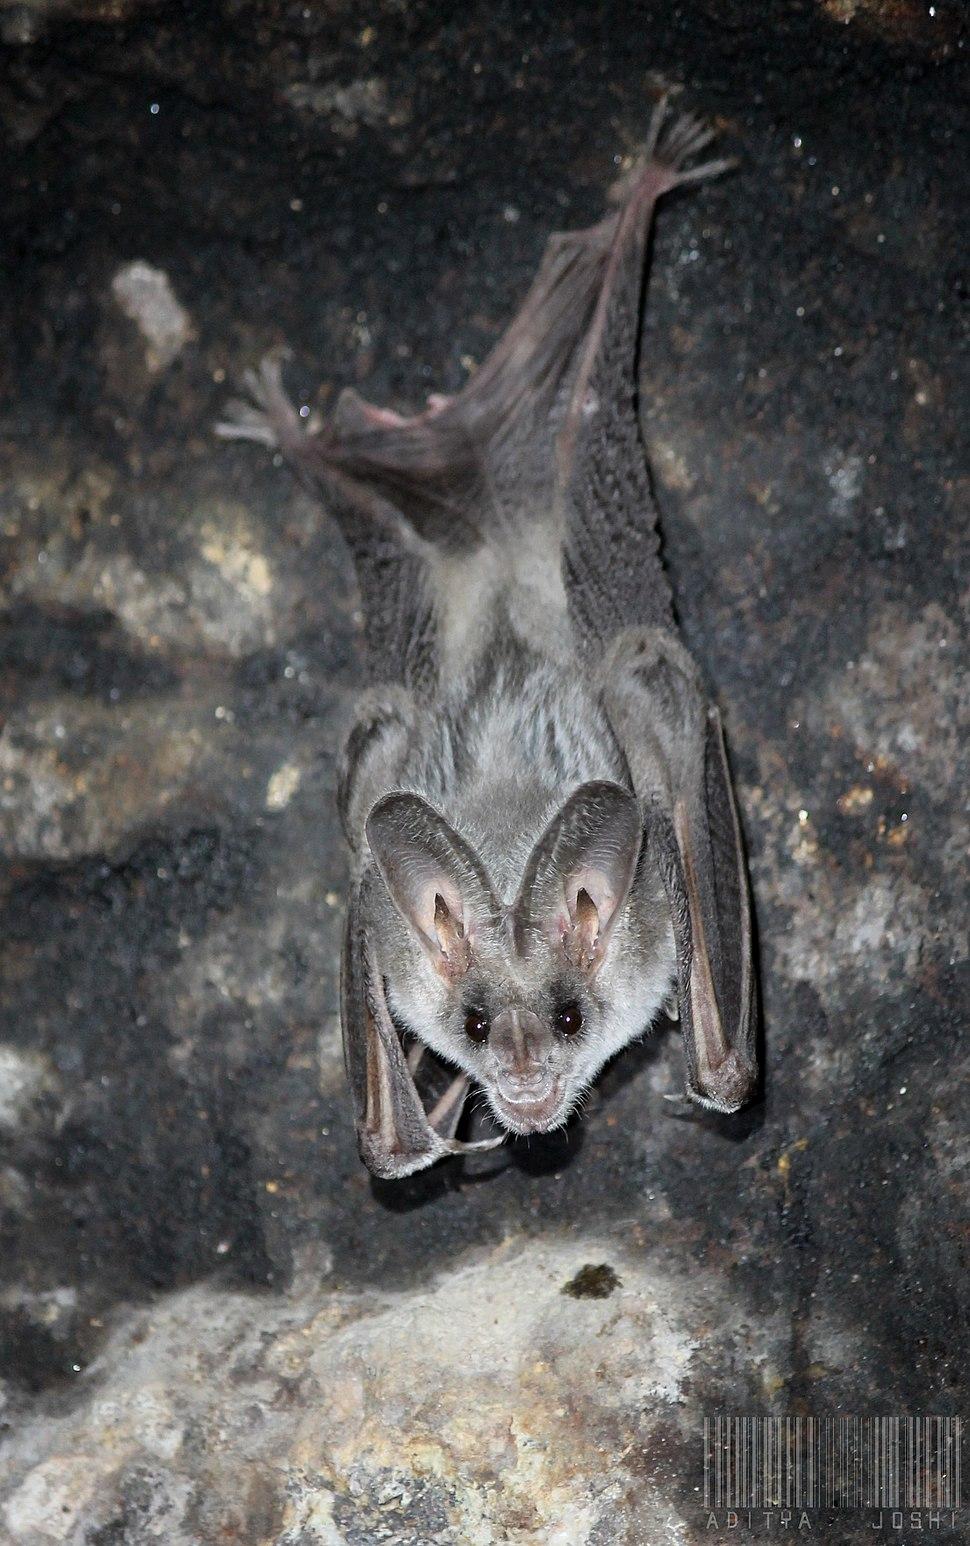 Greater False Vampire Bat (Megaderma lyra)